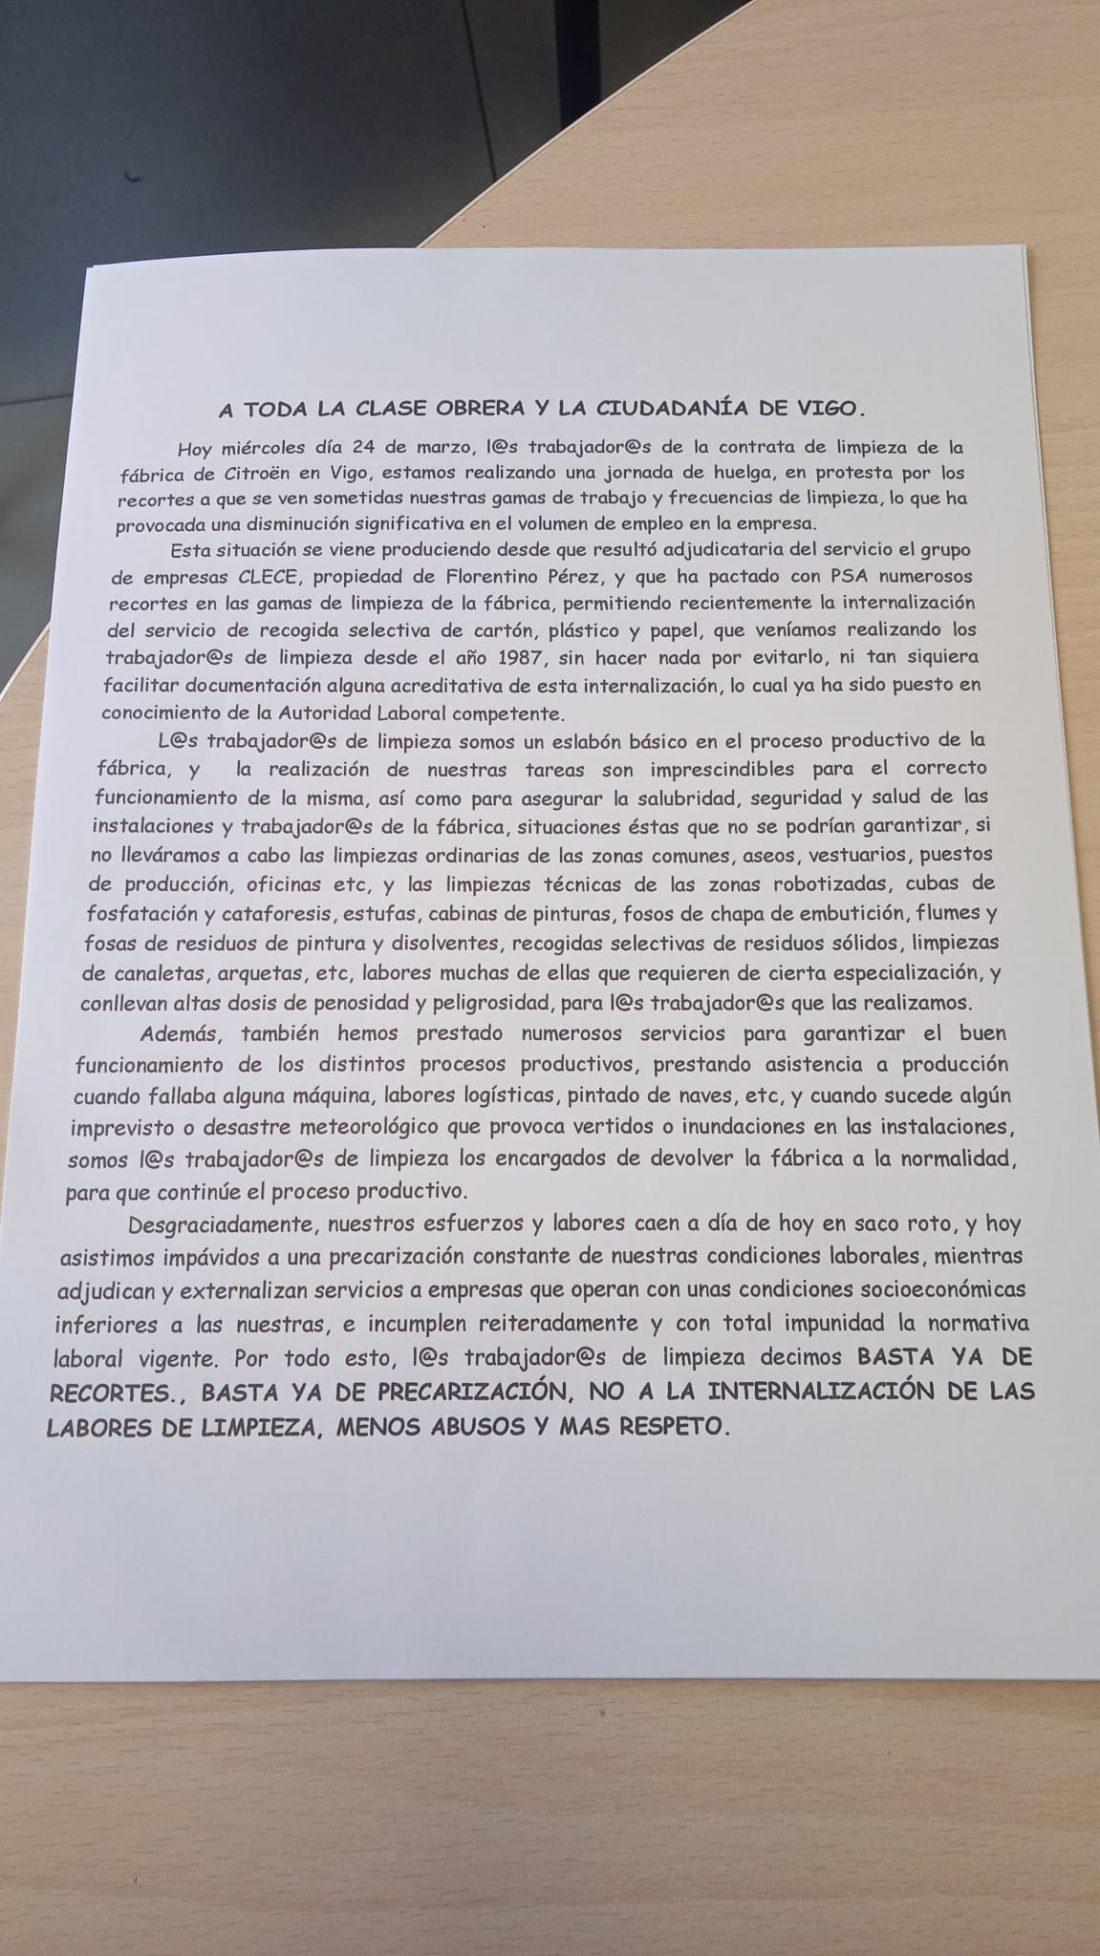 CGT convoca huelga de 24 horas en CLECE-Samain de Citroën de Vigo